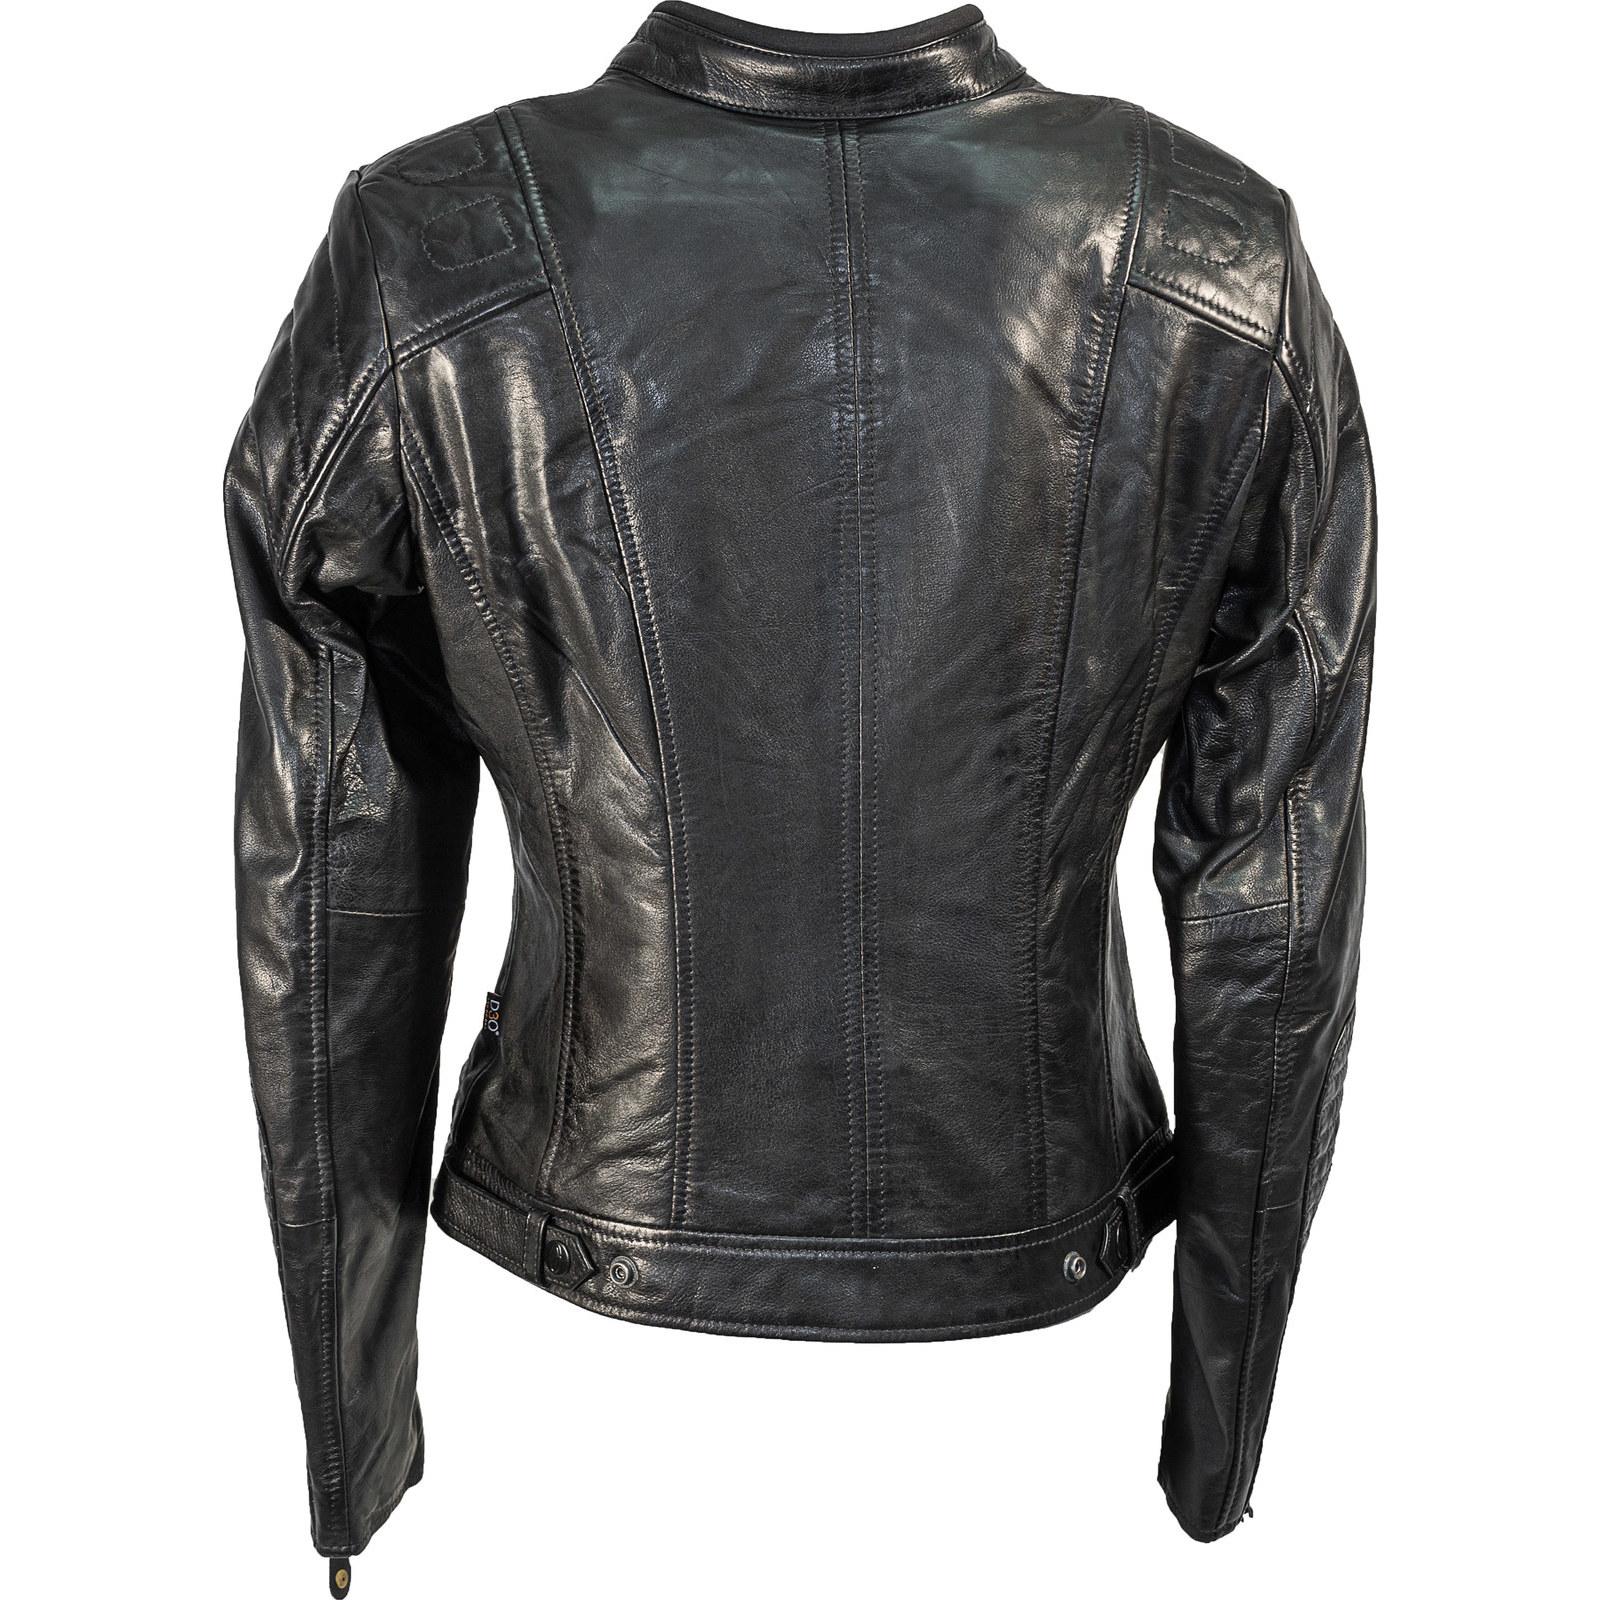 Richa Lausanne Ladies Leather Motorcycle Jacket Womens Street ...